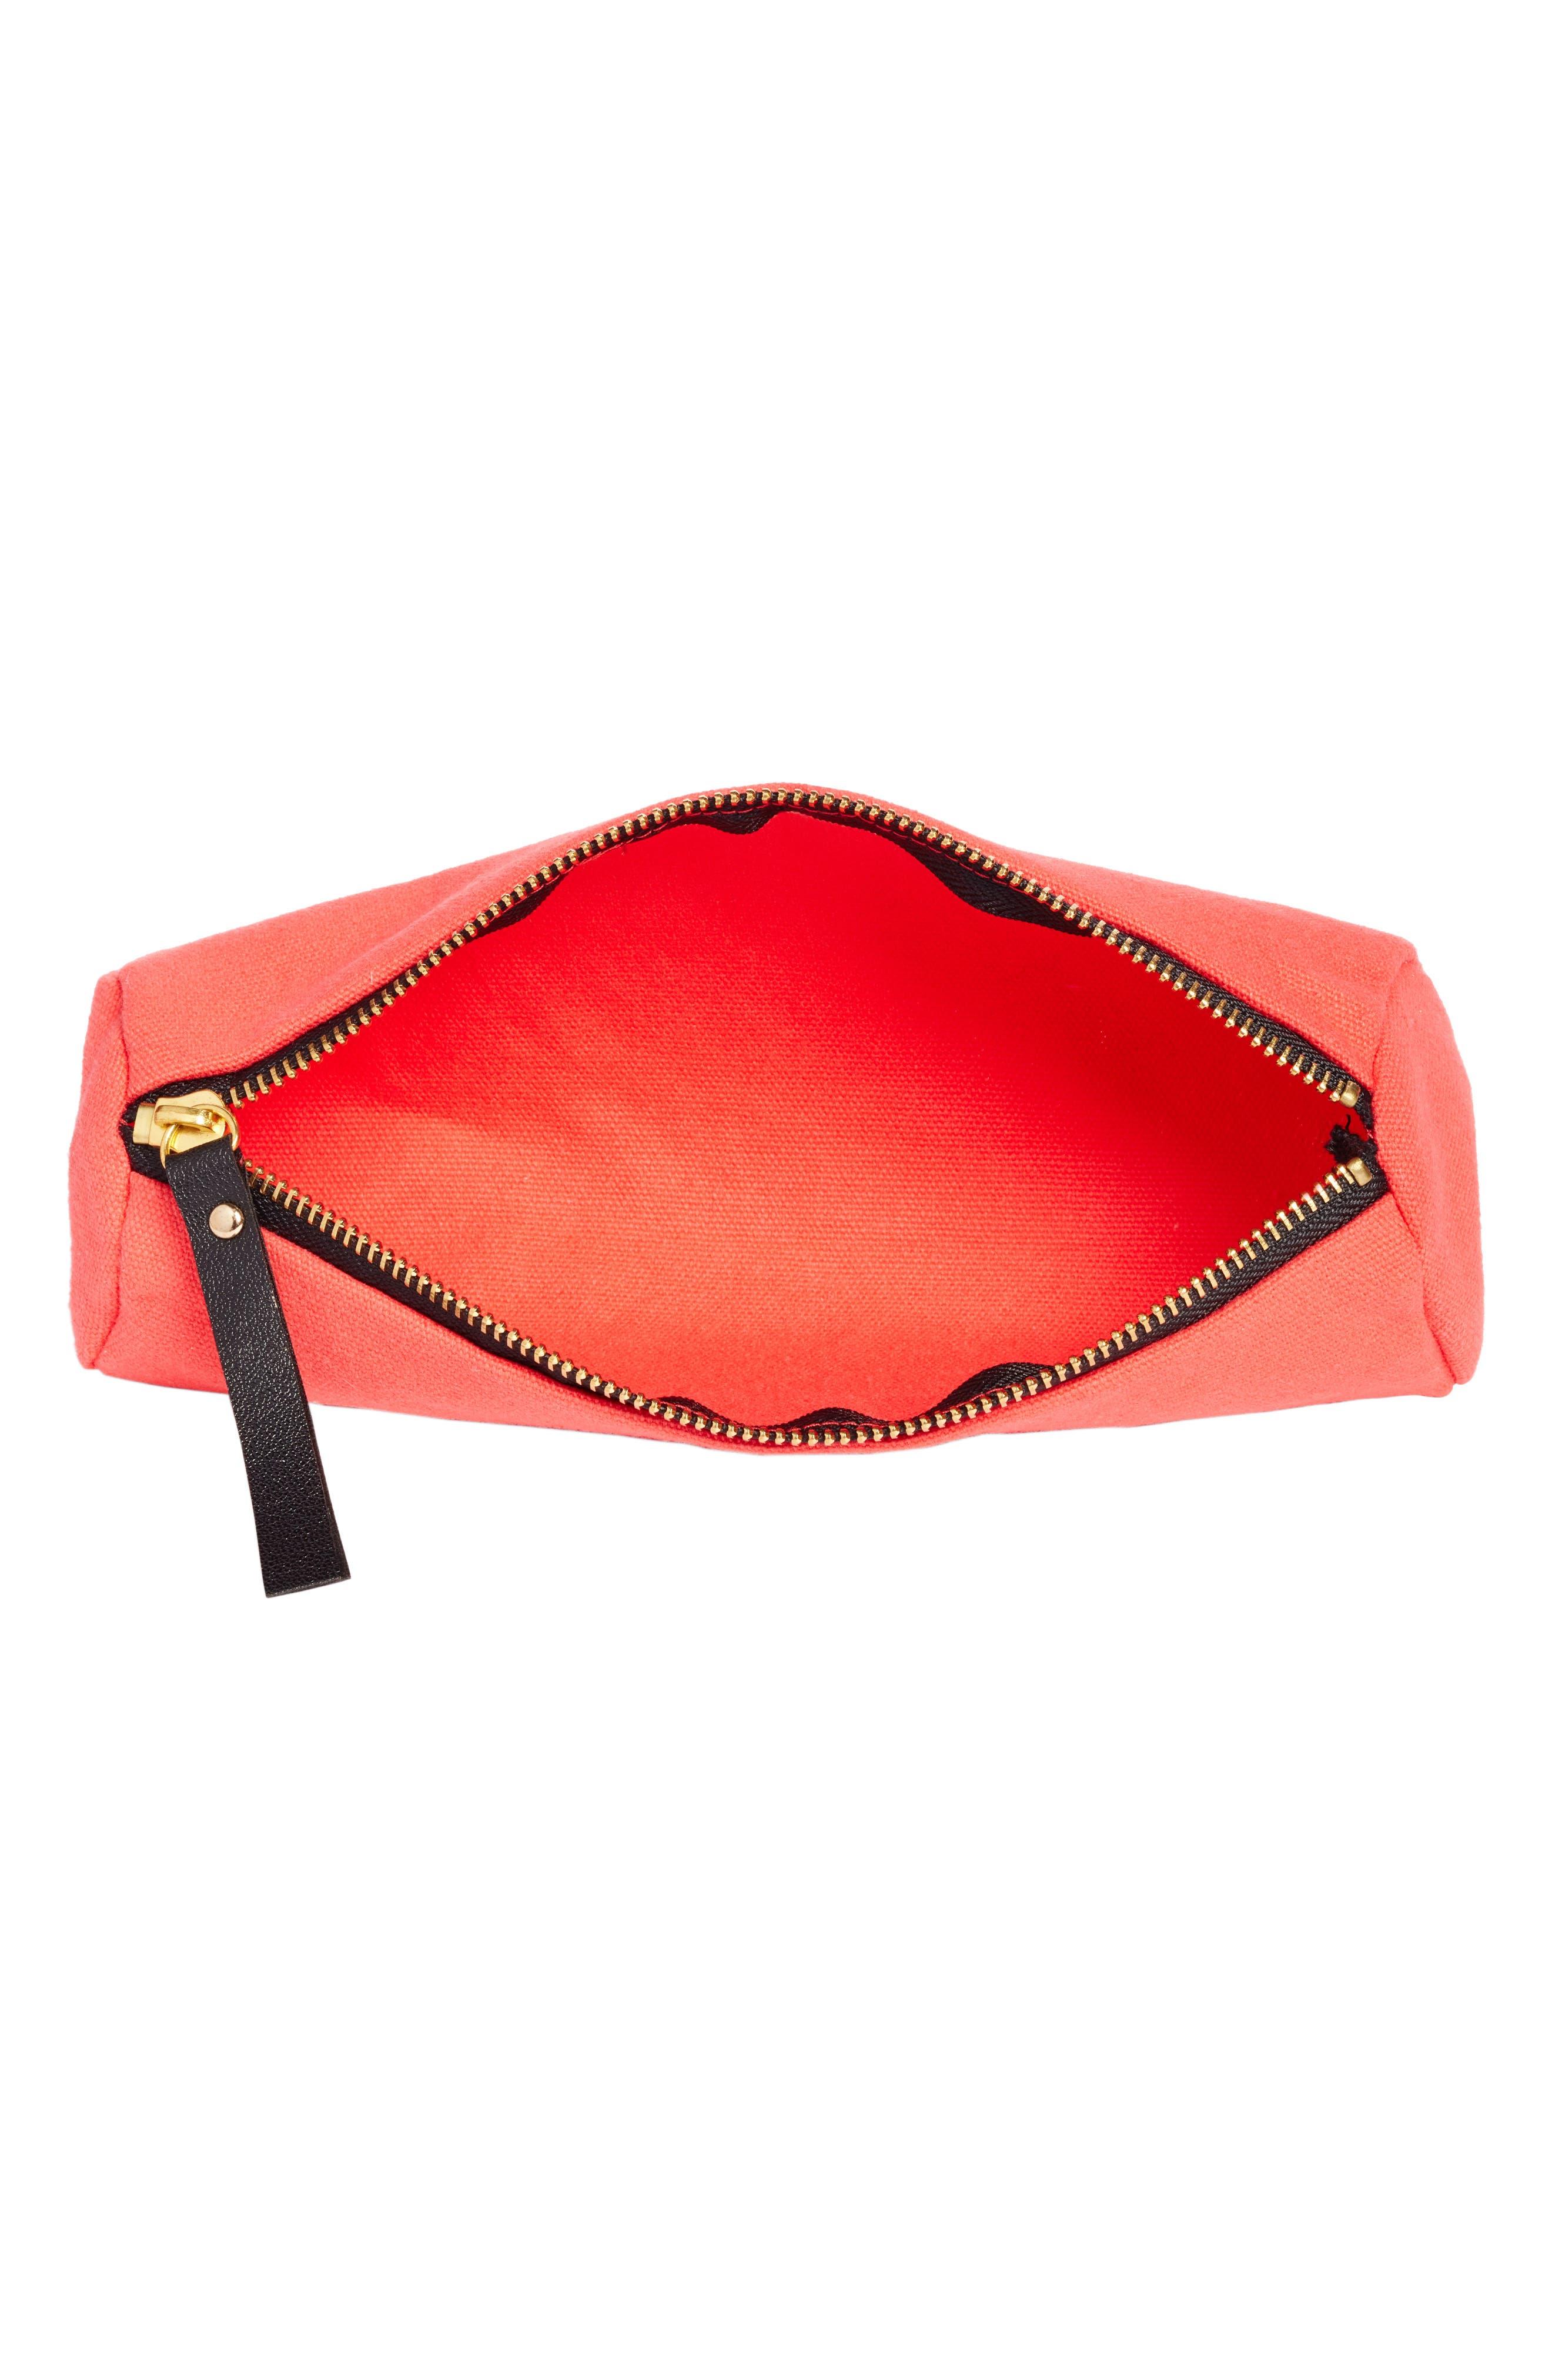 Levex Tubular Storage Bag,                             Alternate thumbnail 3, color,                             680